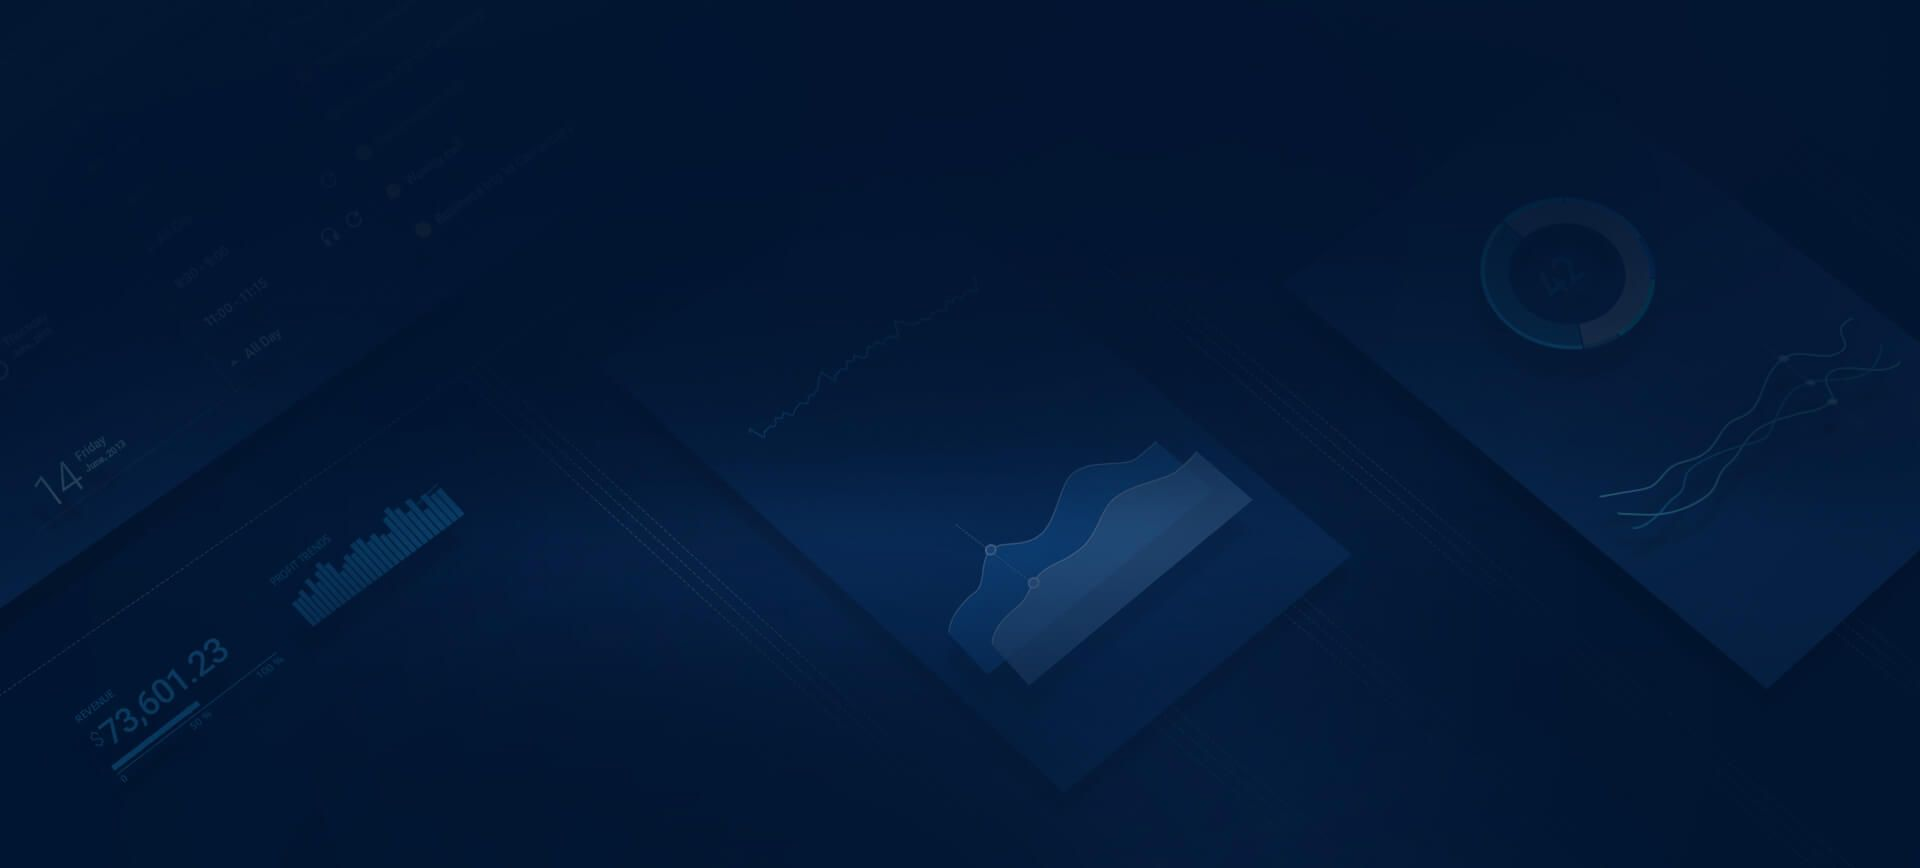 Data Analytics Background Google Search Business Card Design